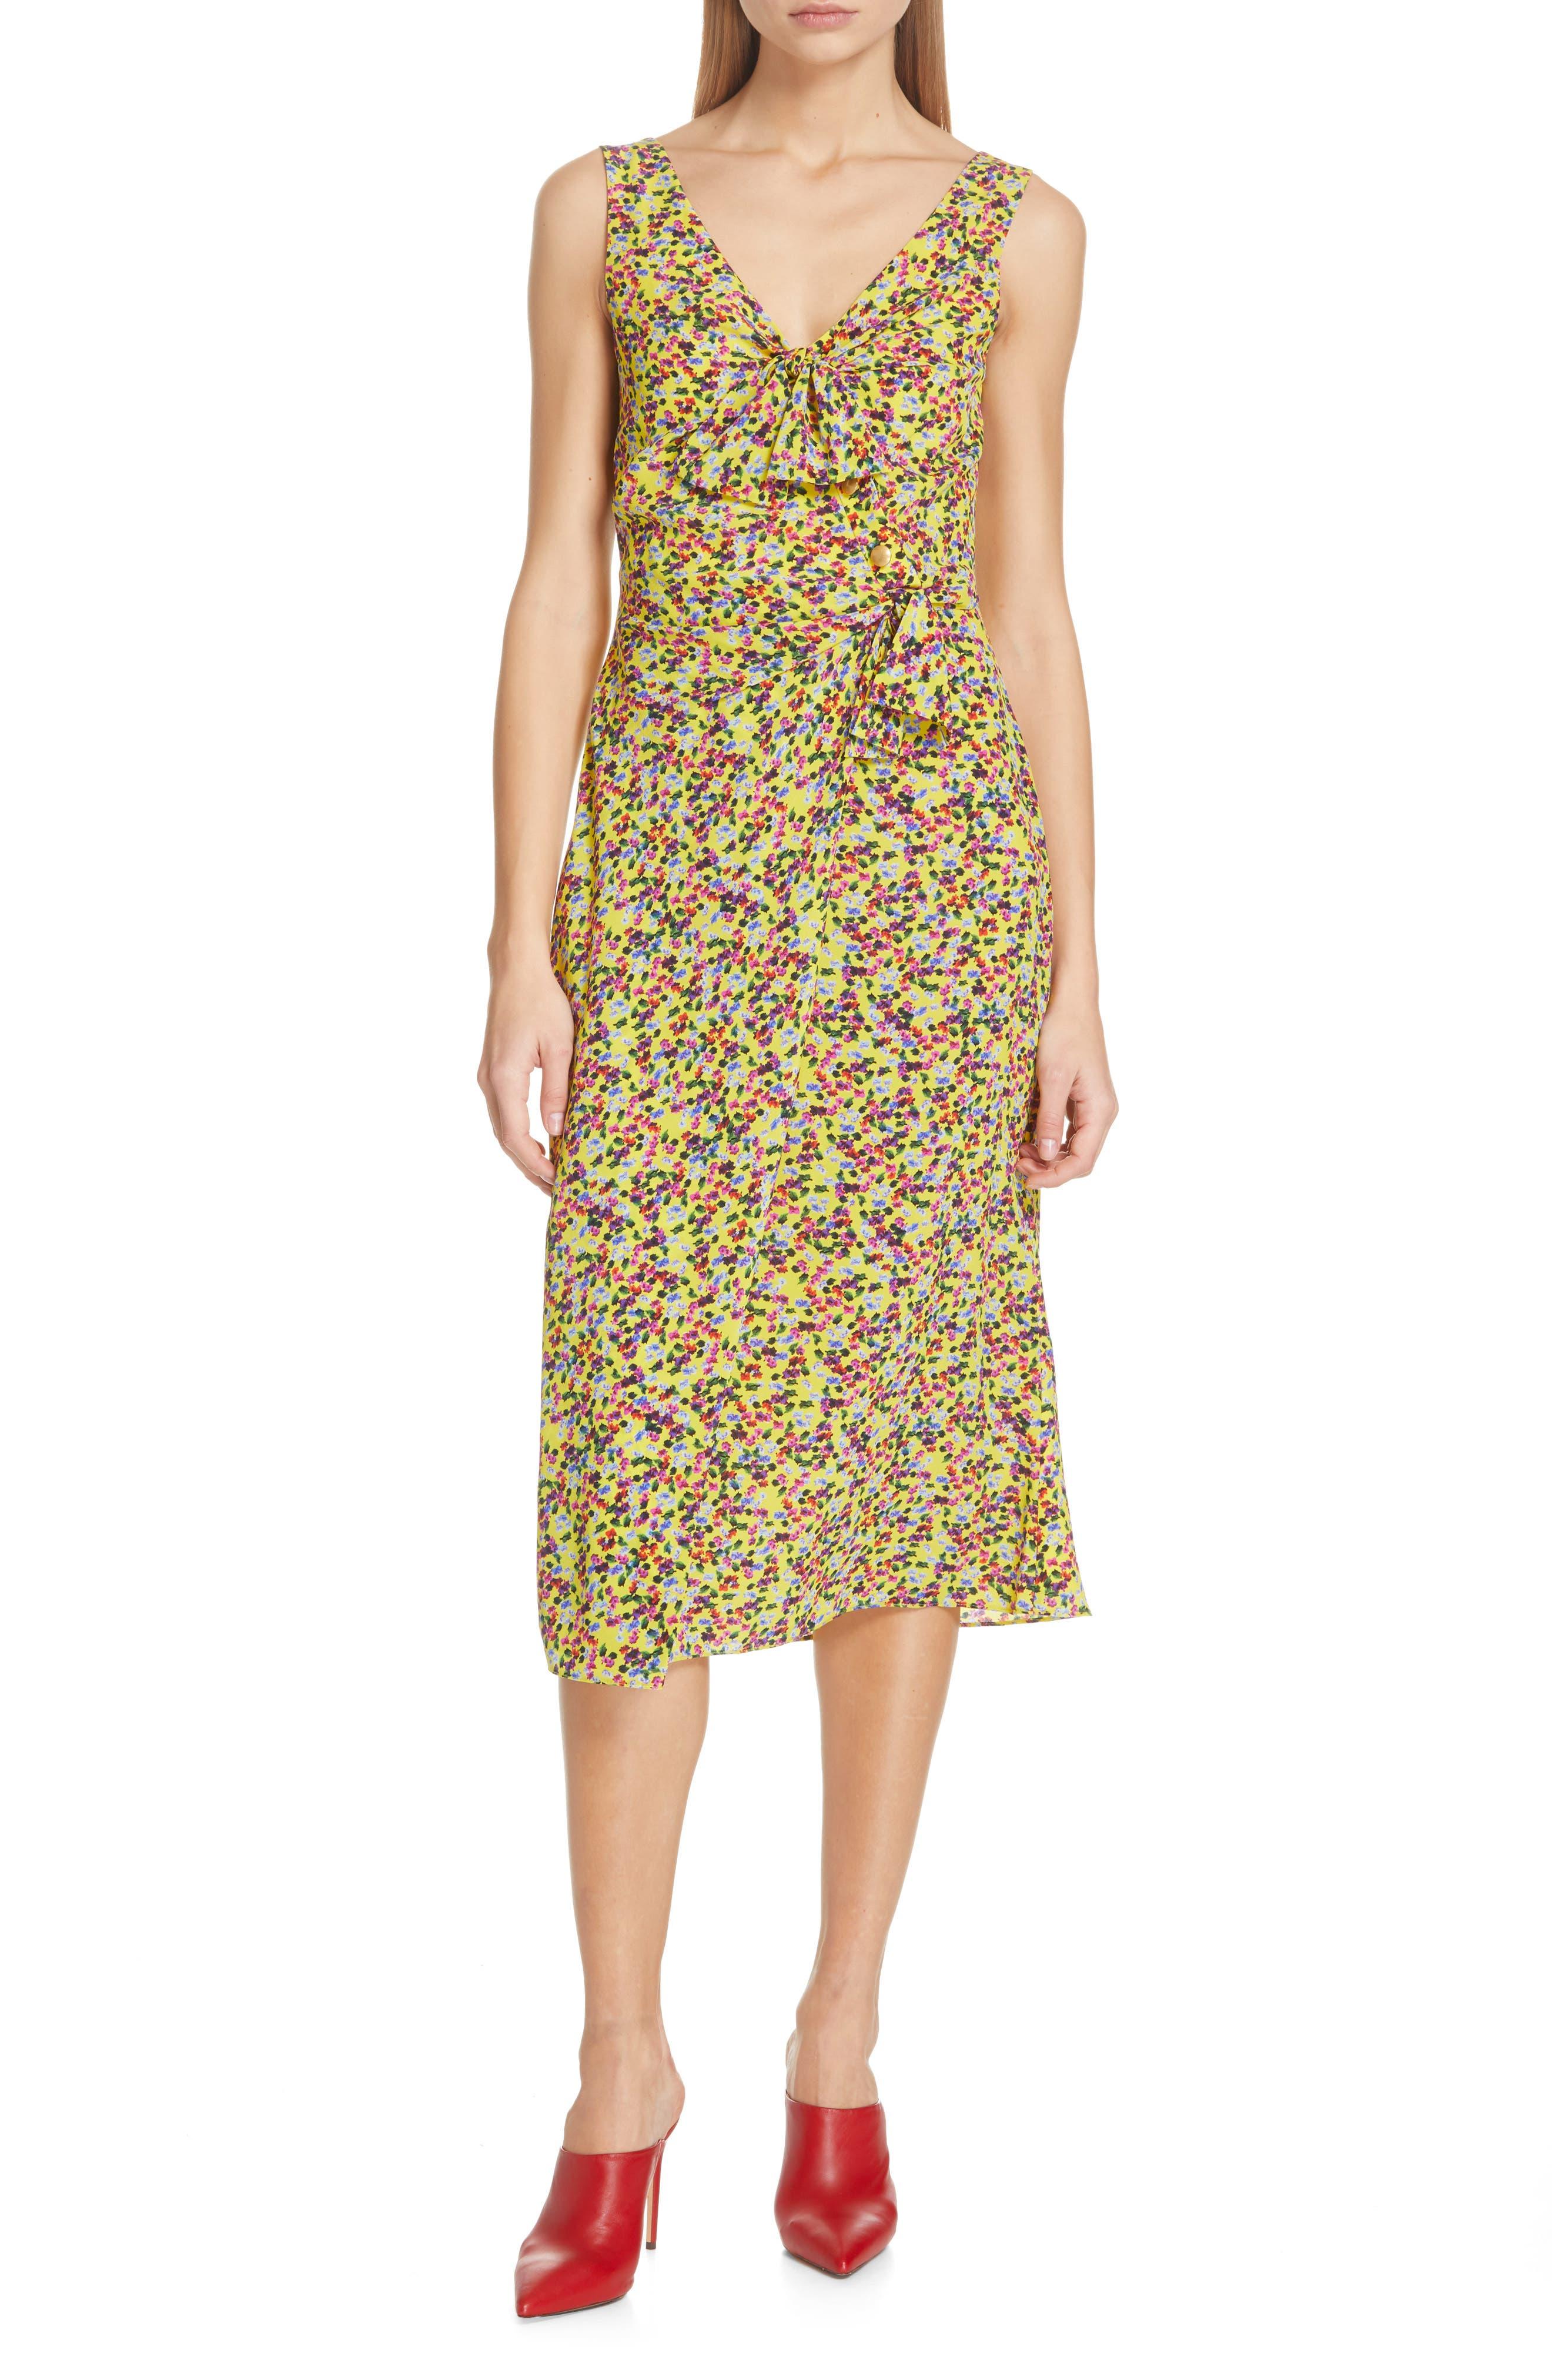 SALONI, Penelope Floral Print Silk Midi Dress, Main thumbnail 1, color, YELLOW GARDENIA